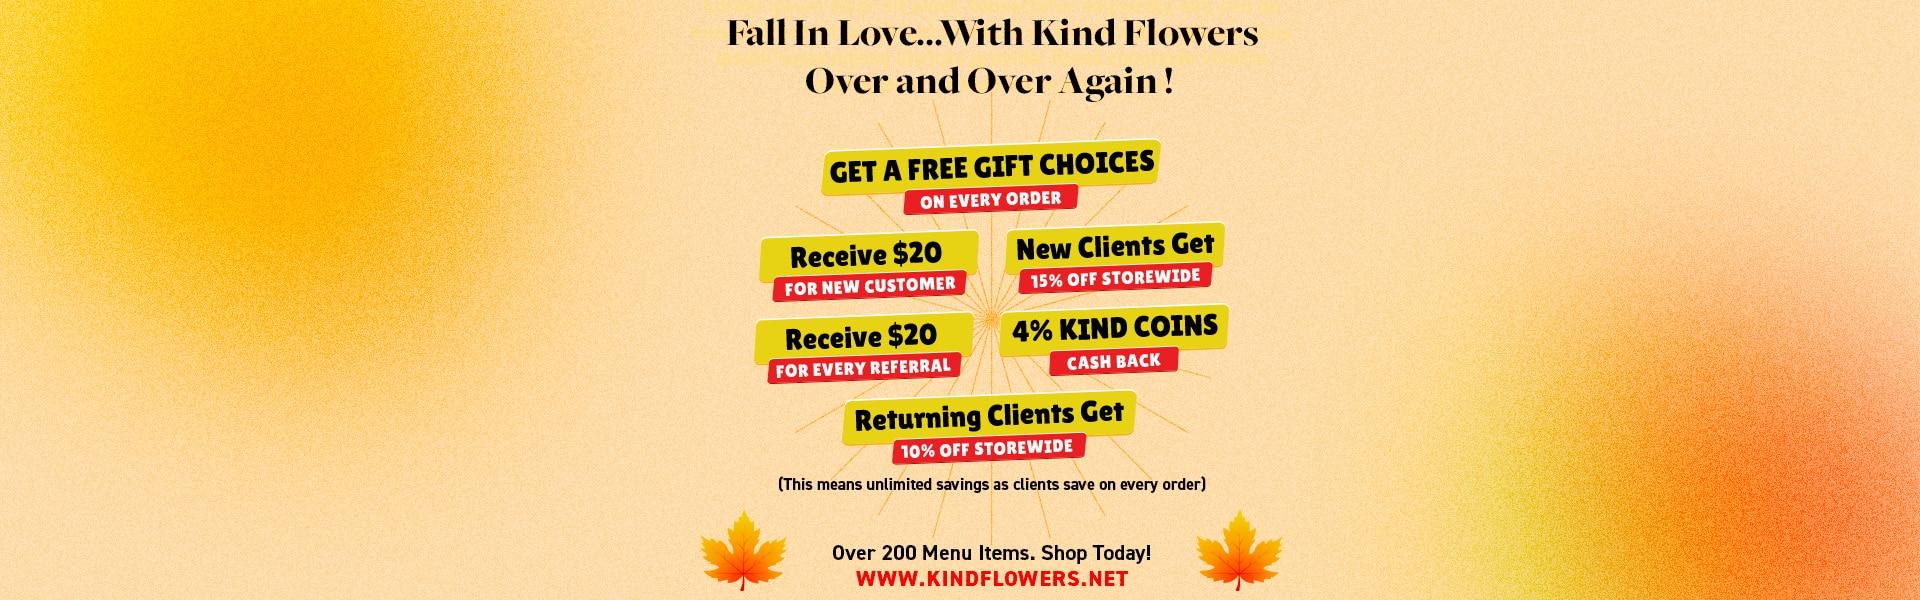 fall-promo-website-banner--3